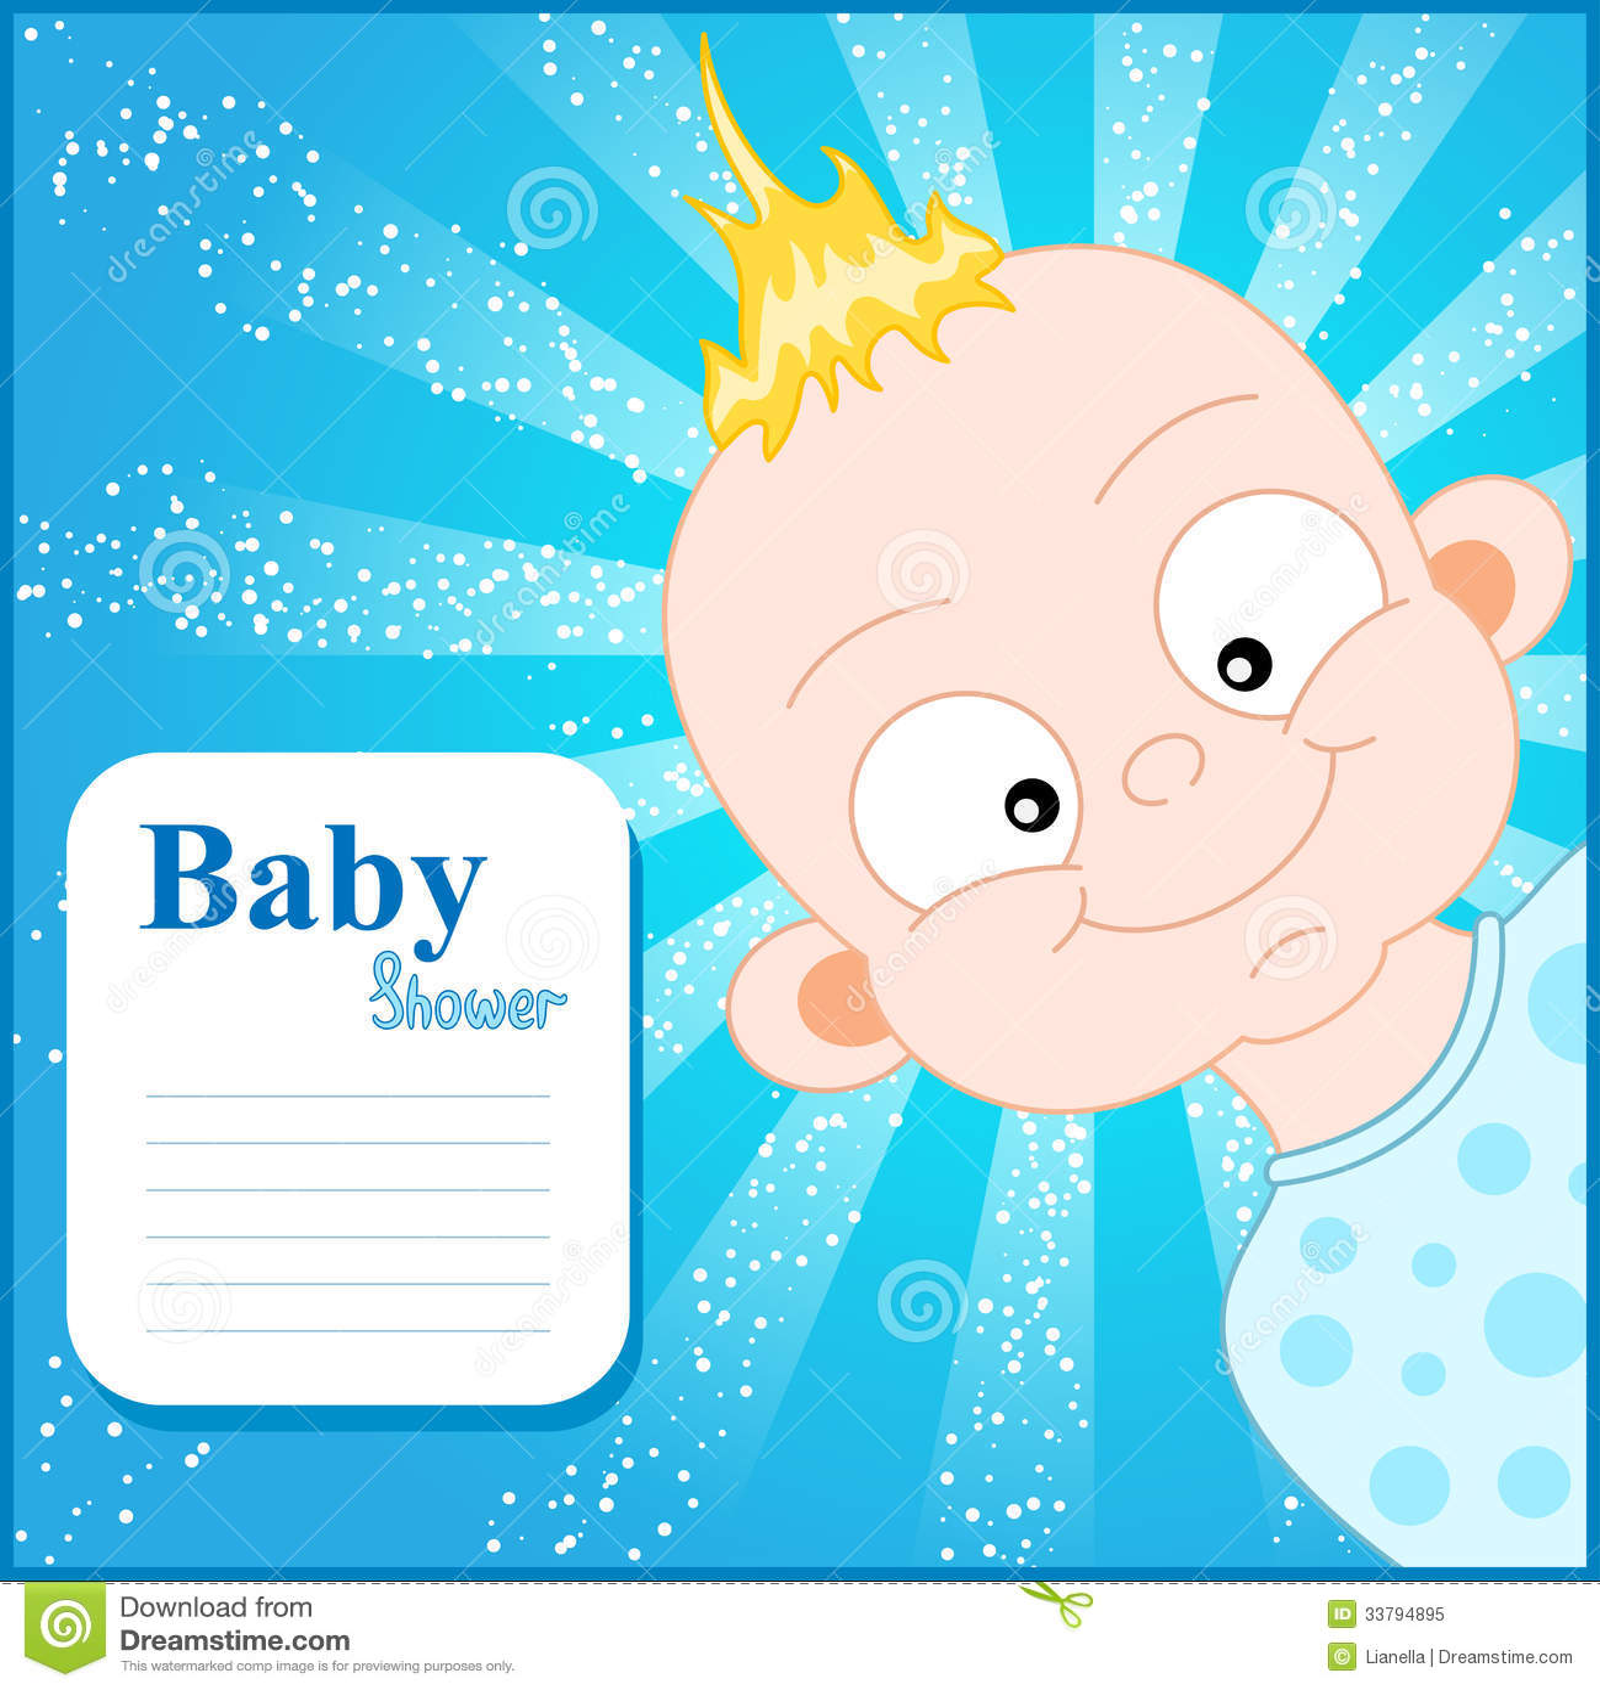 bunny baby shower invitations custom invitation template design